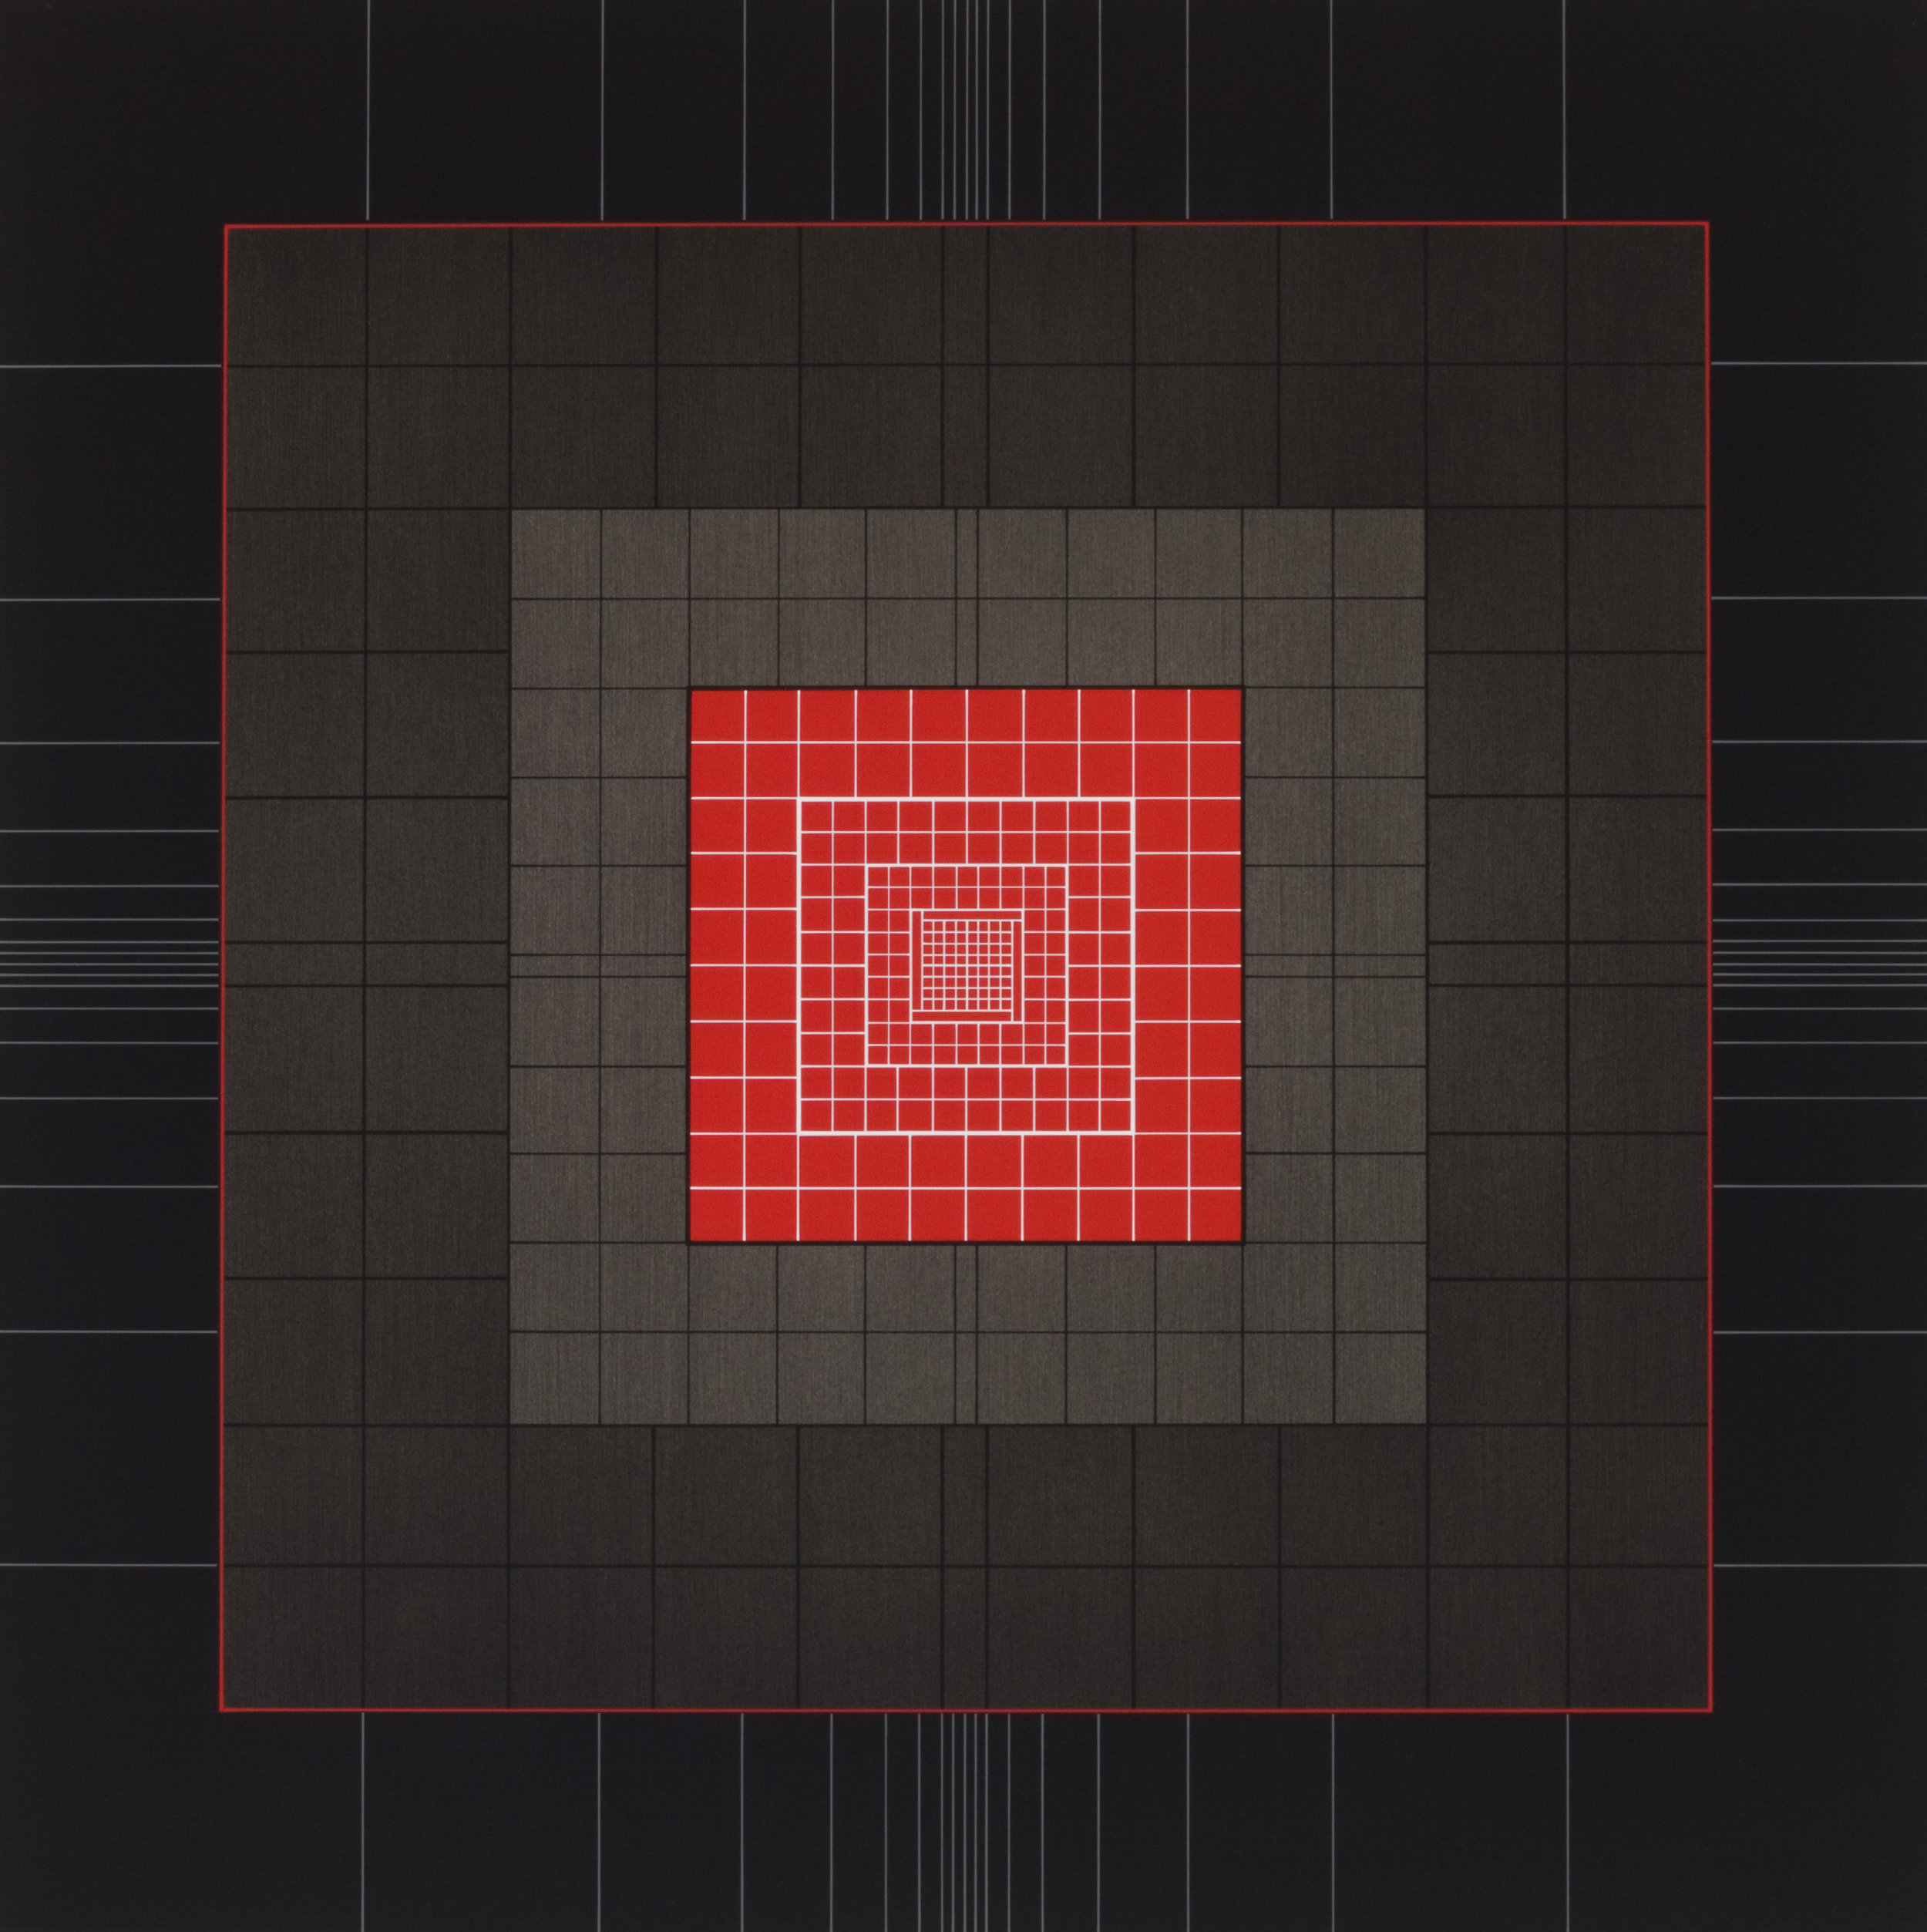 Yantra-ipsum-creator(4)2013.Jan, acrylic on canvas, 29 1/2 x 29 1/2 in. [75x75cm]